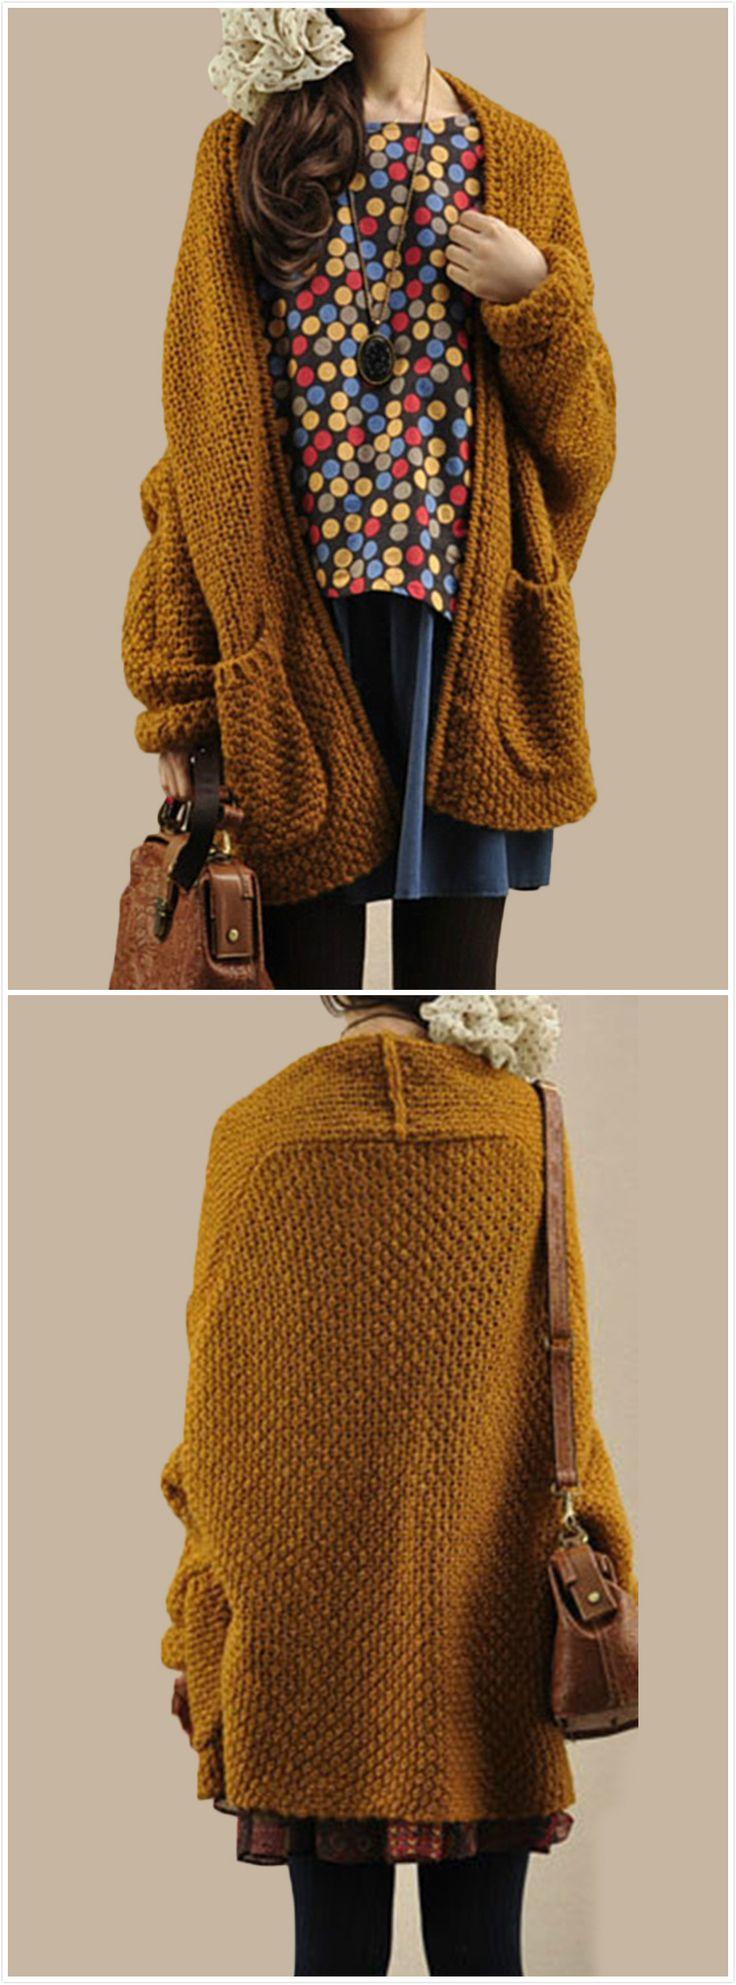 Best 25+ Mustard jumper ideas on Pinterest | Mustard sweater ...